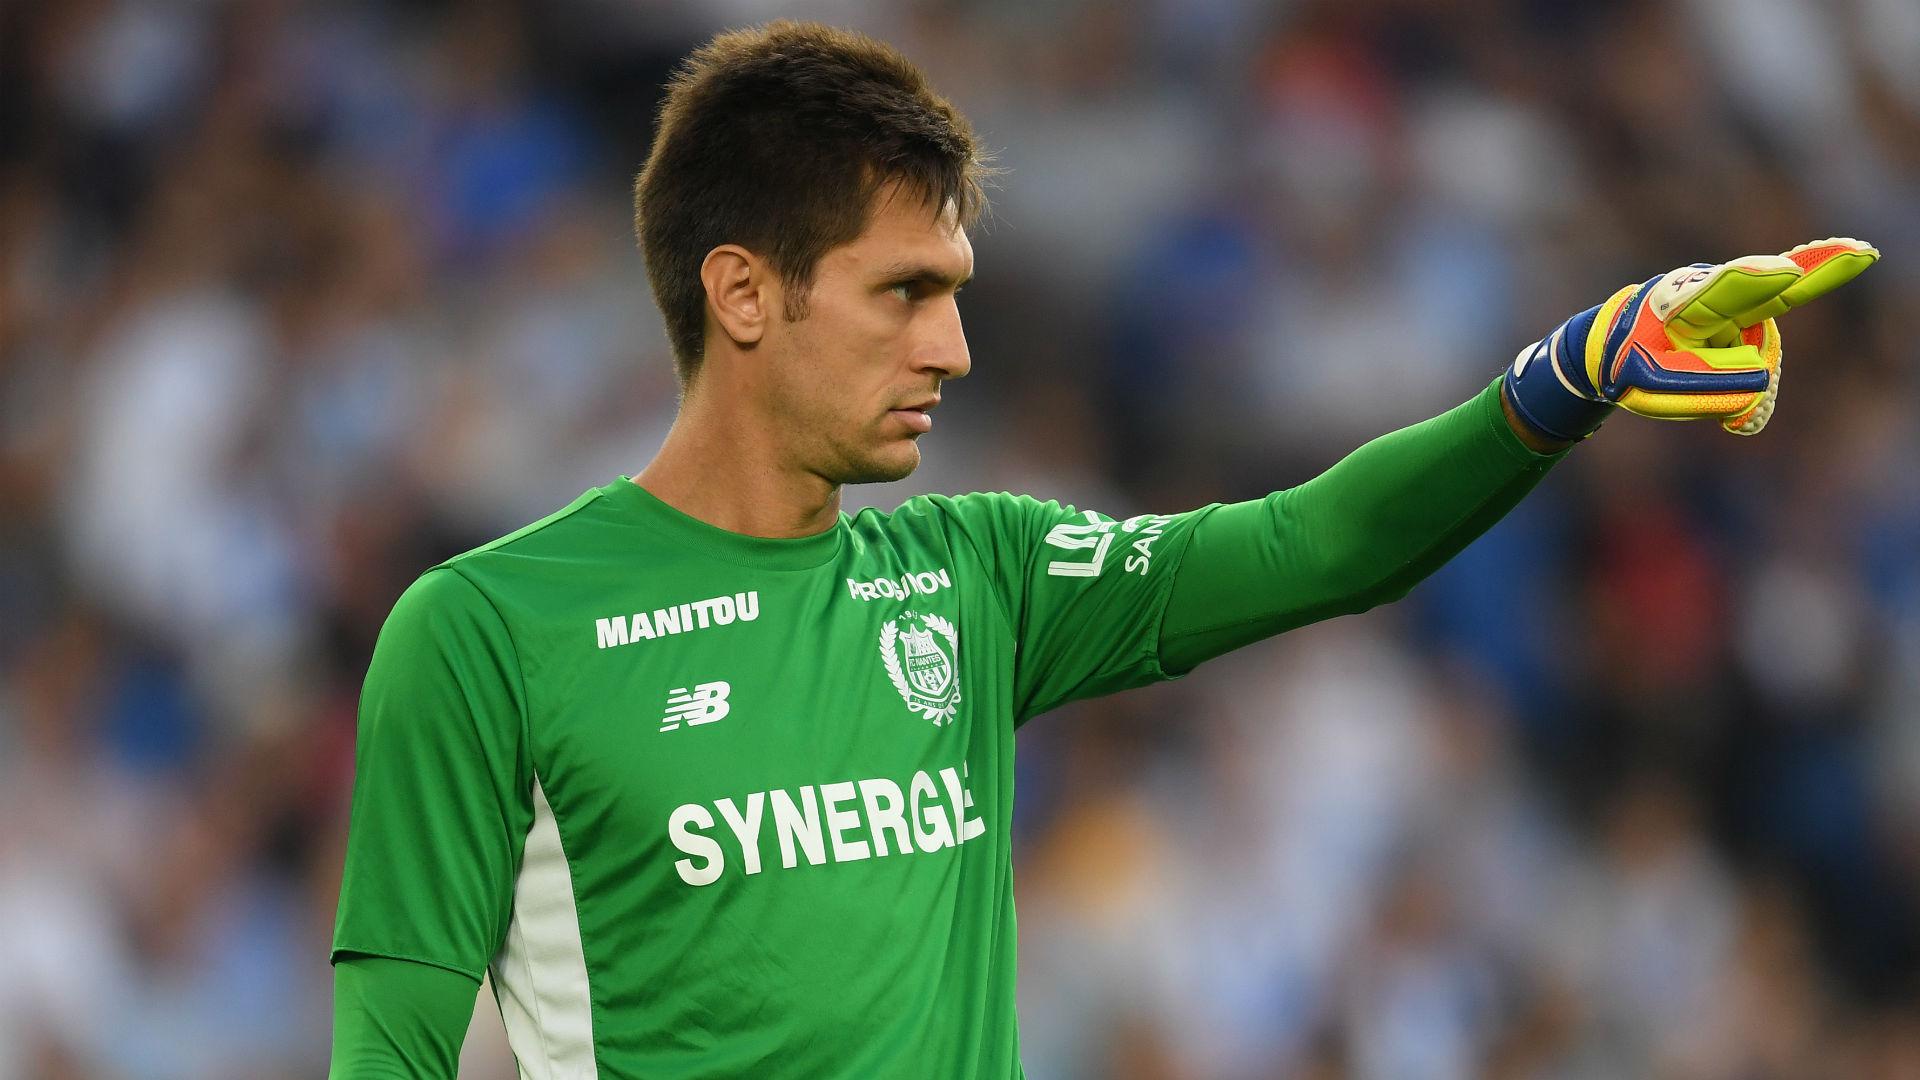 Lyon swoop for goalkeeper Tatarusanu